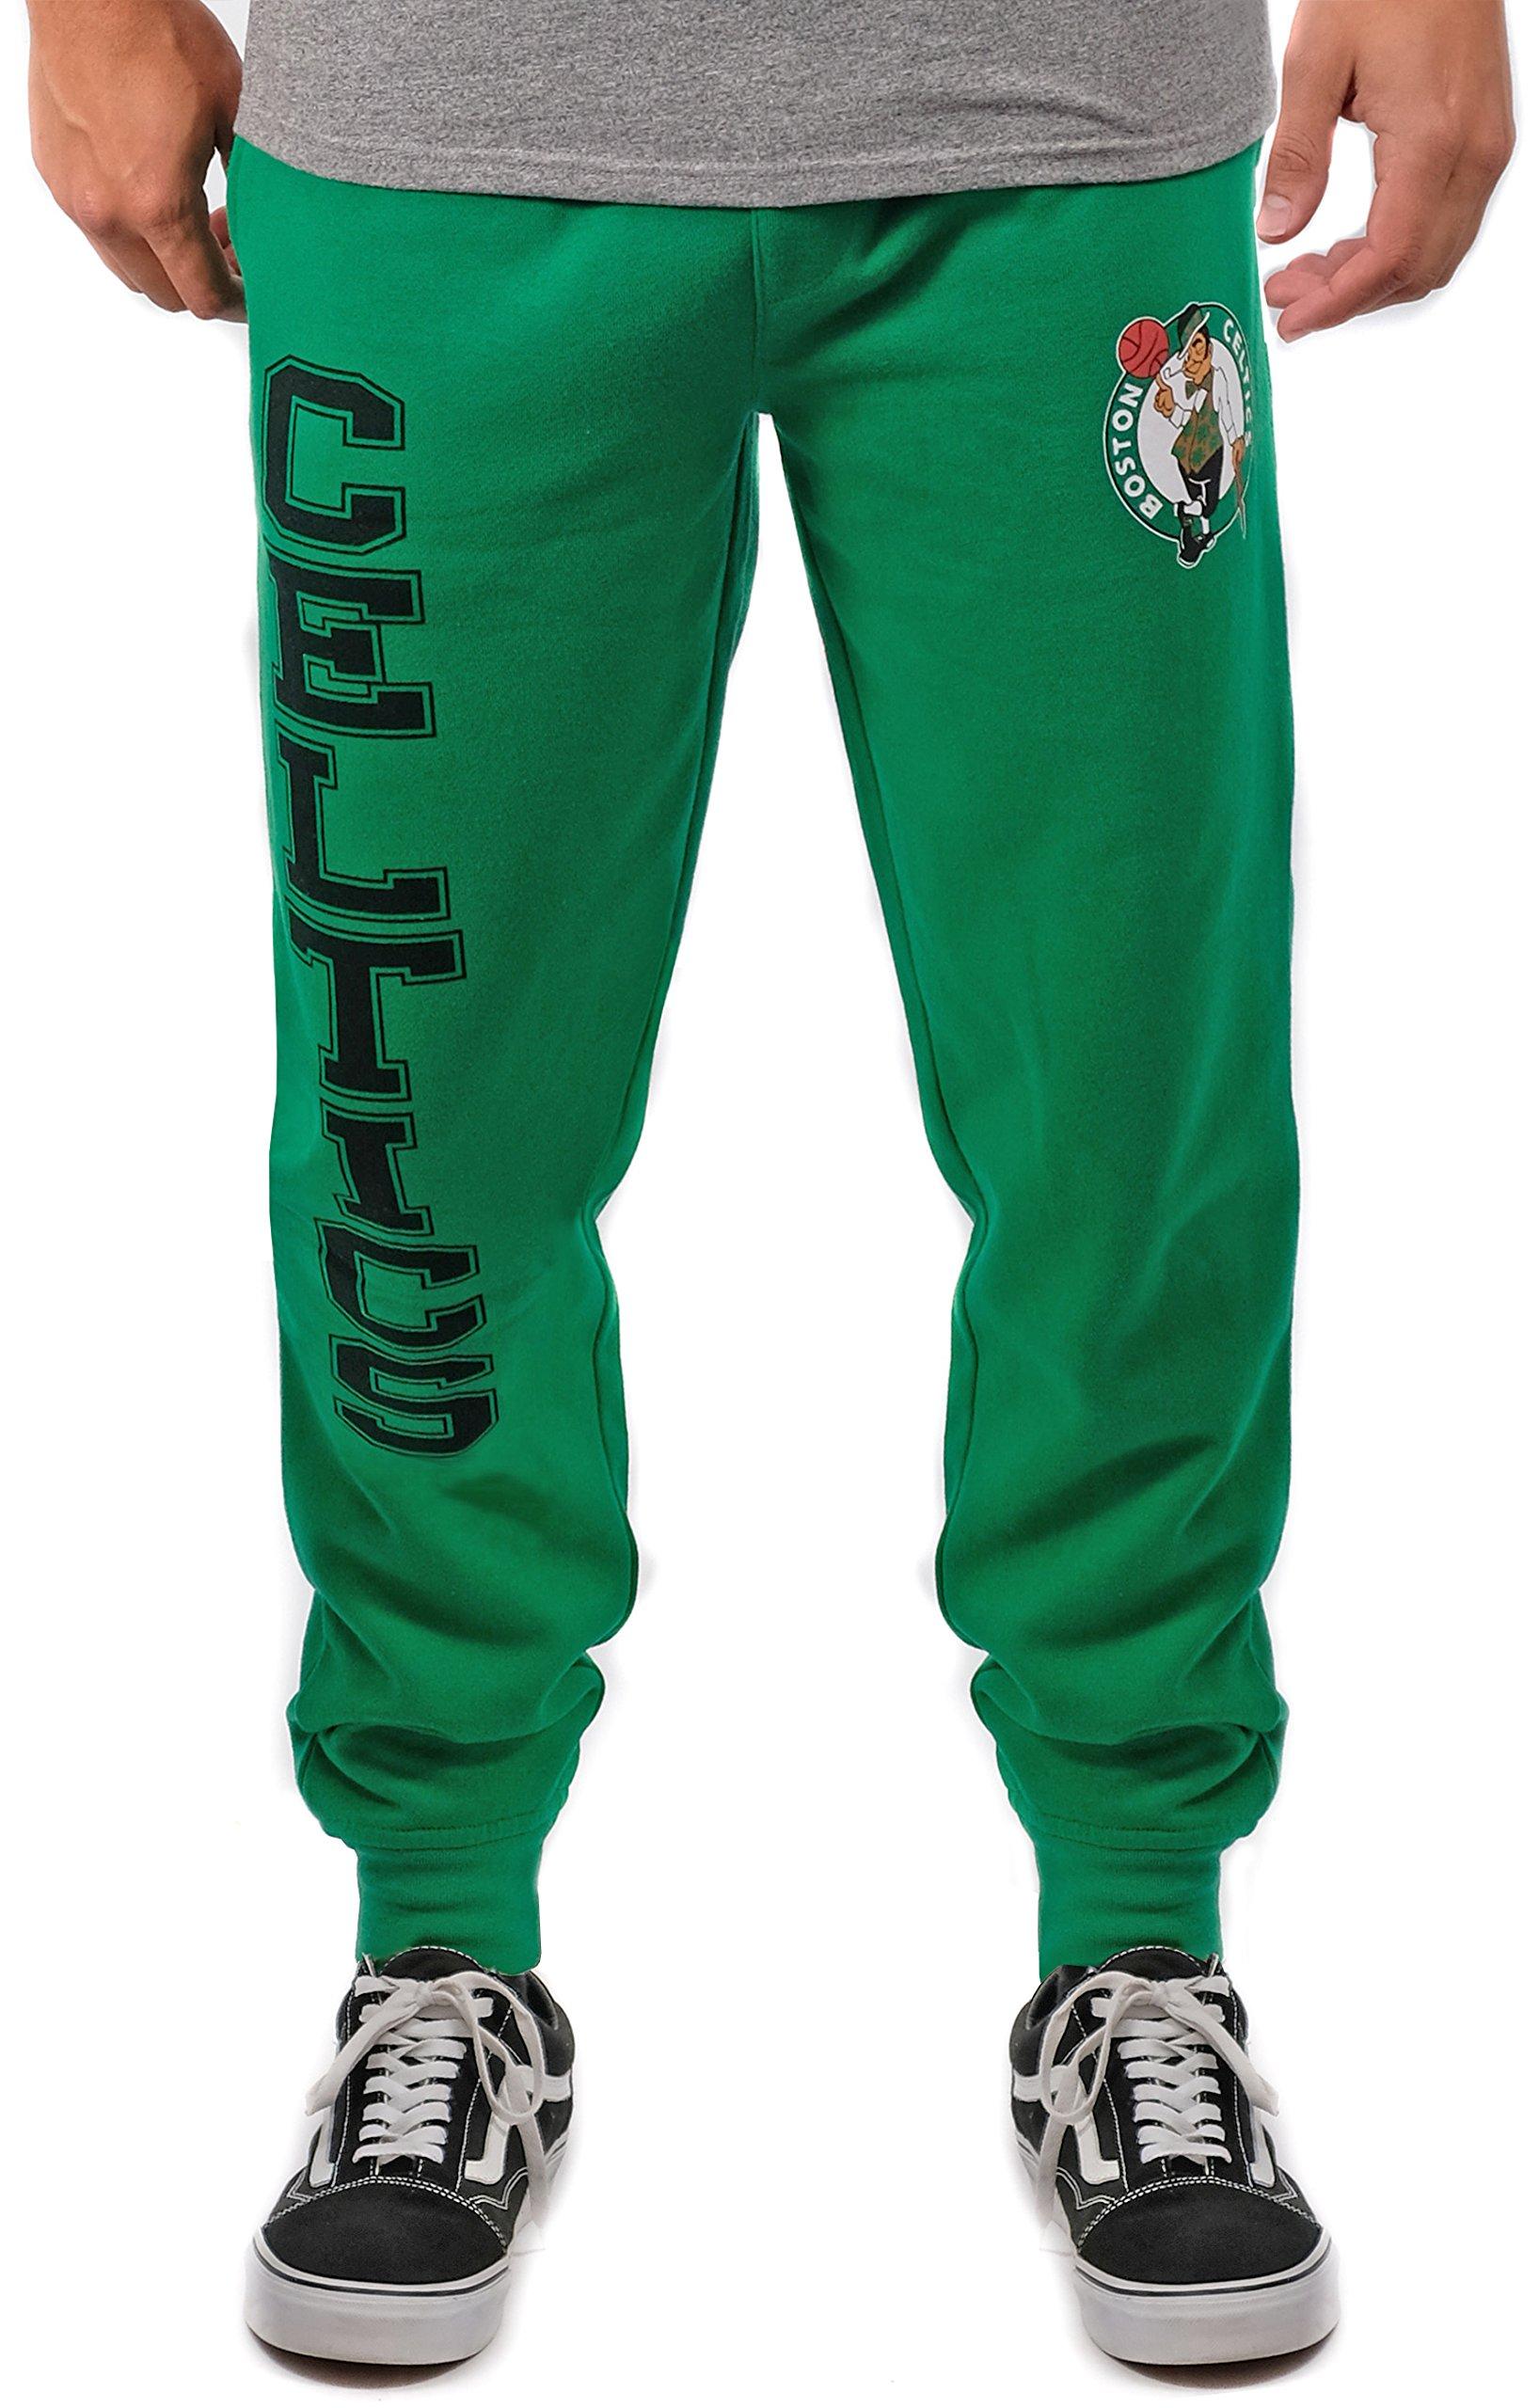 11ef19429 Galleon - NBA Boston Celtics Men s Jogger Pants Active Basic Soft Terry  Sweatpants